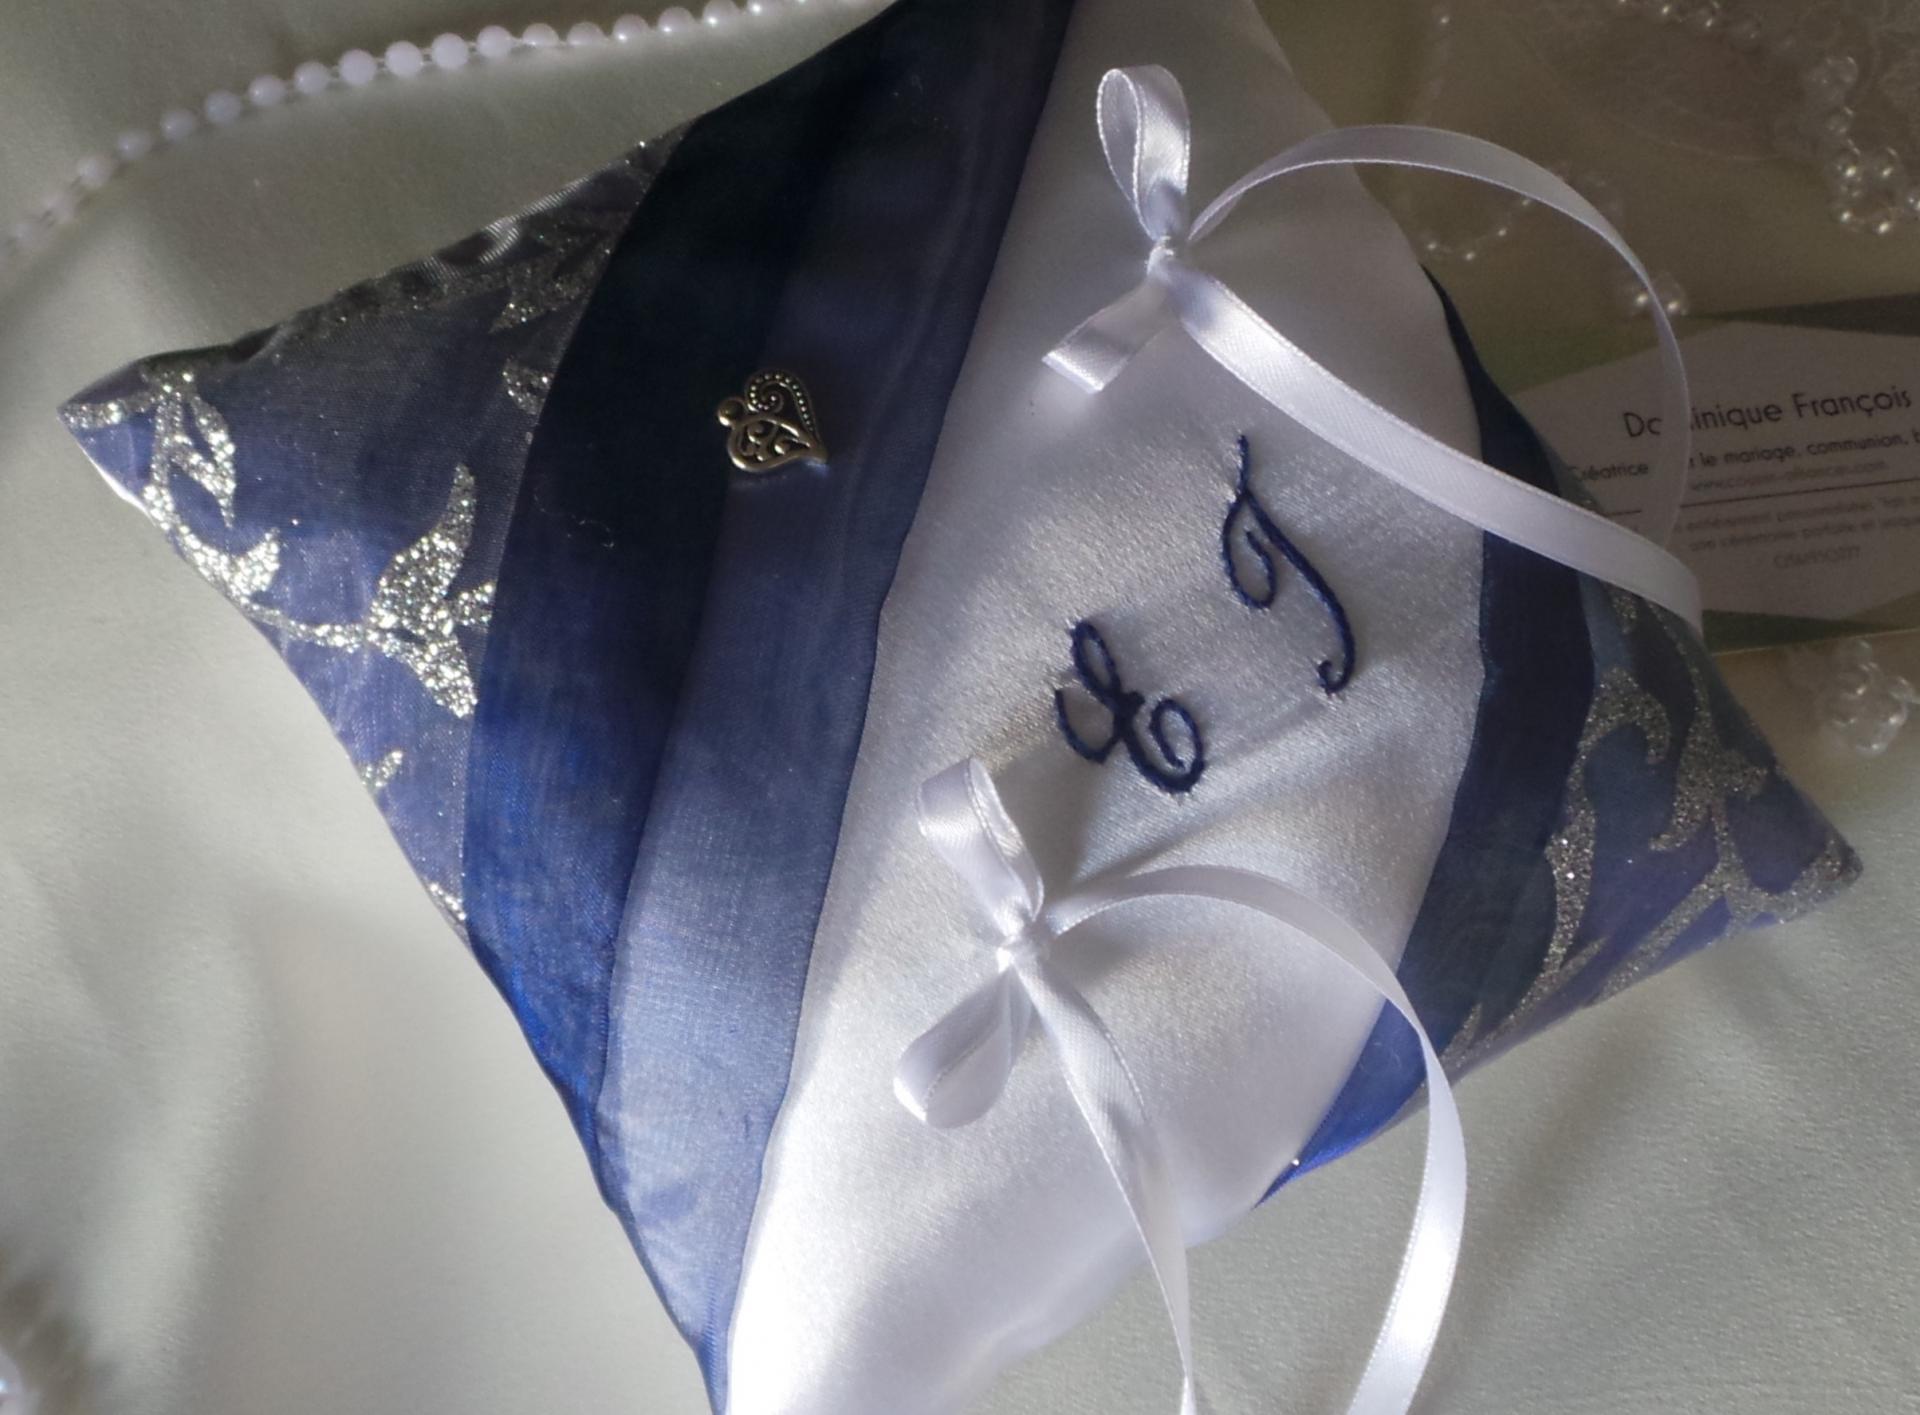 Coussin mariage bleu marine argent